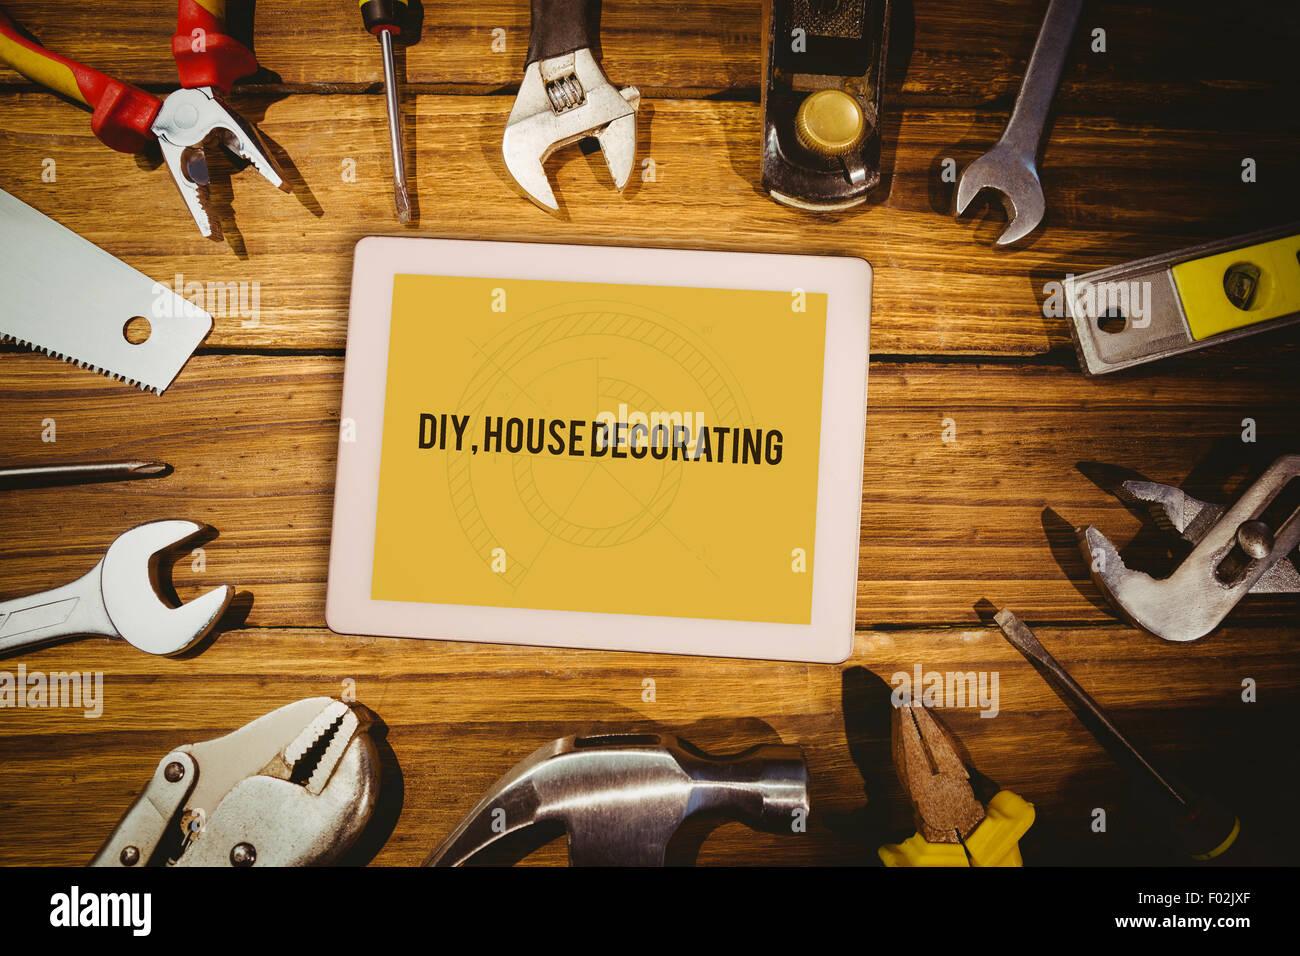 Diy, house decorating against blueprint - Stock Image